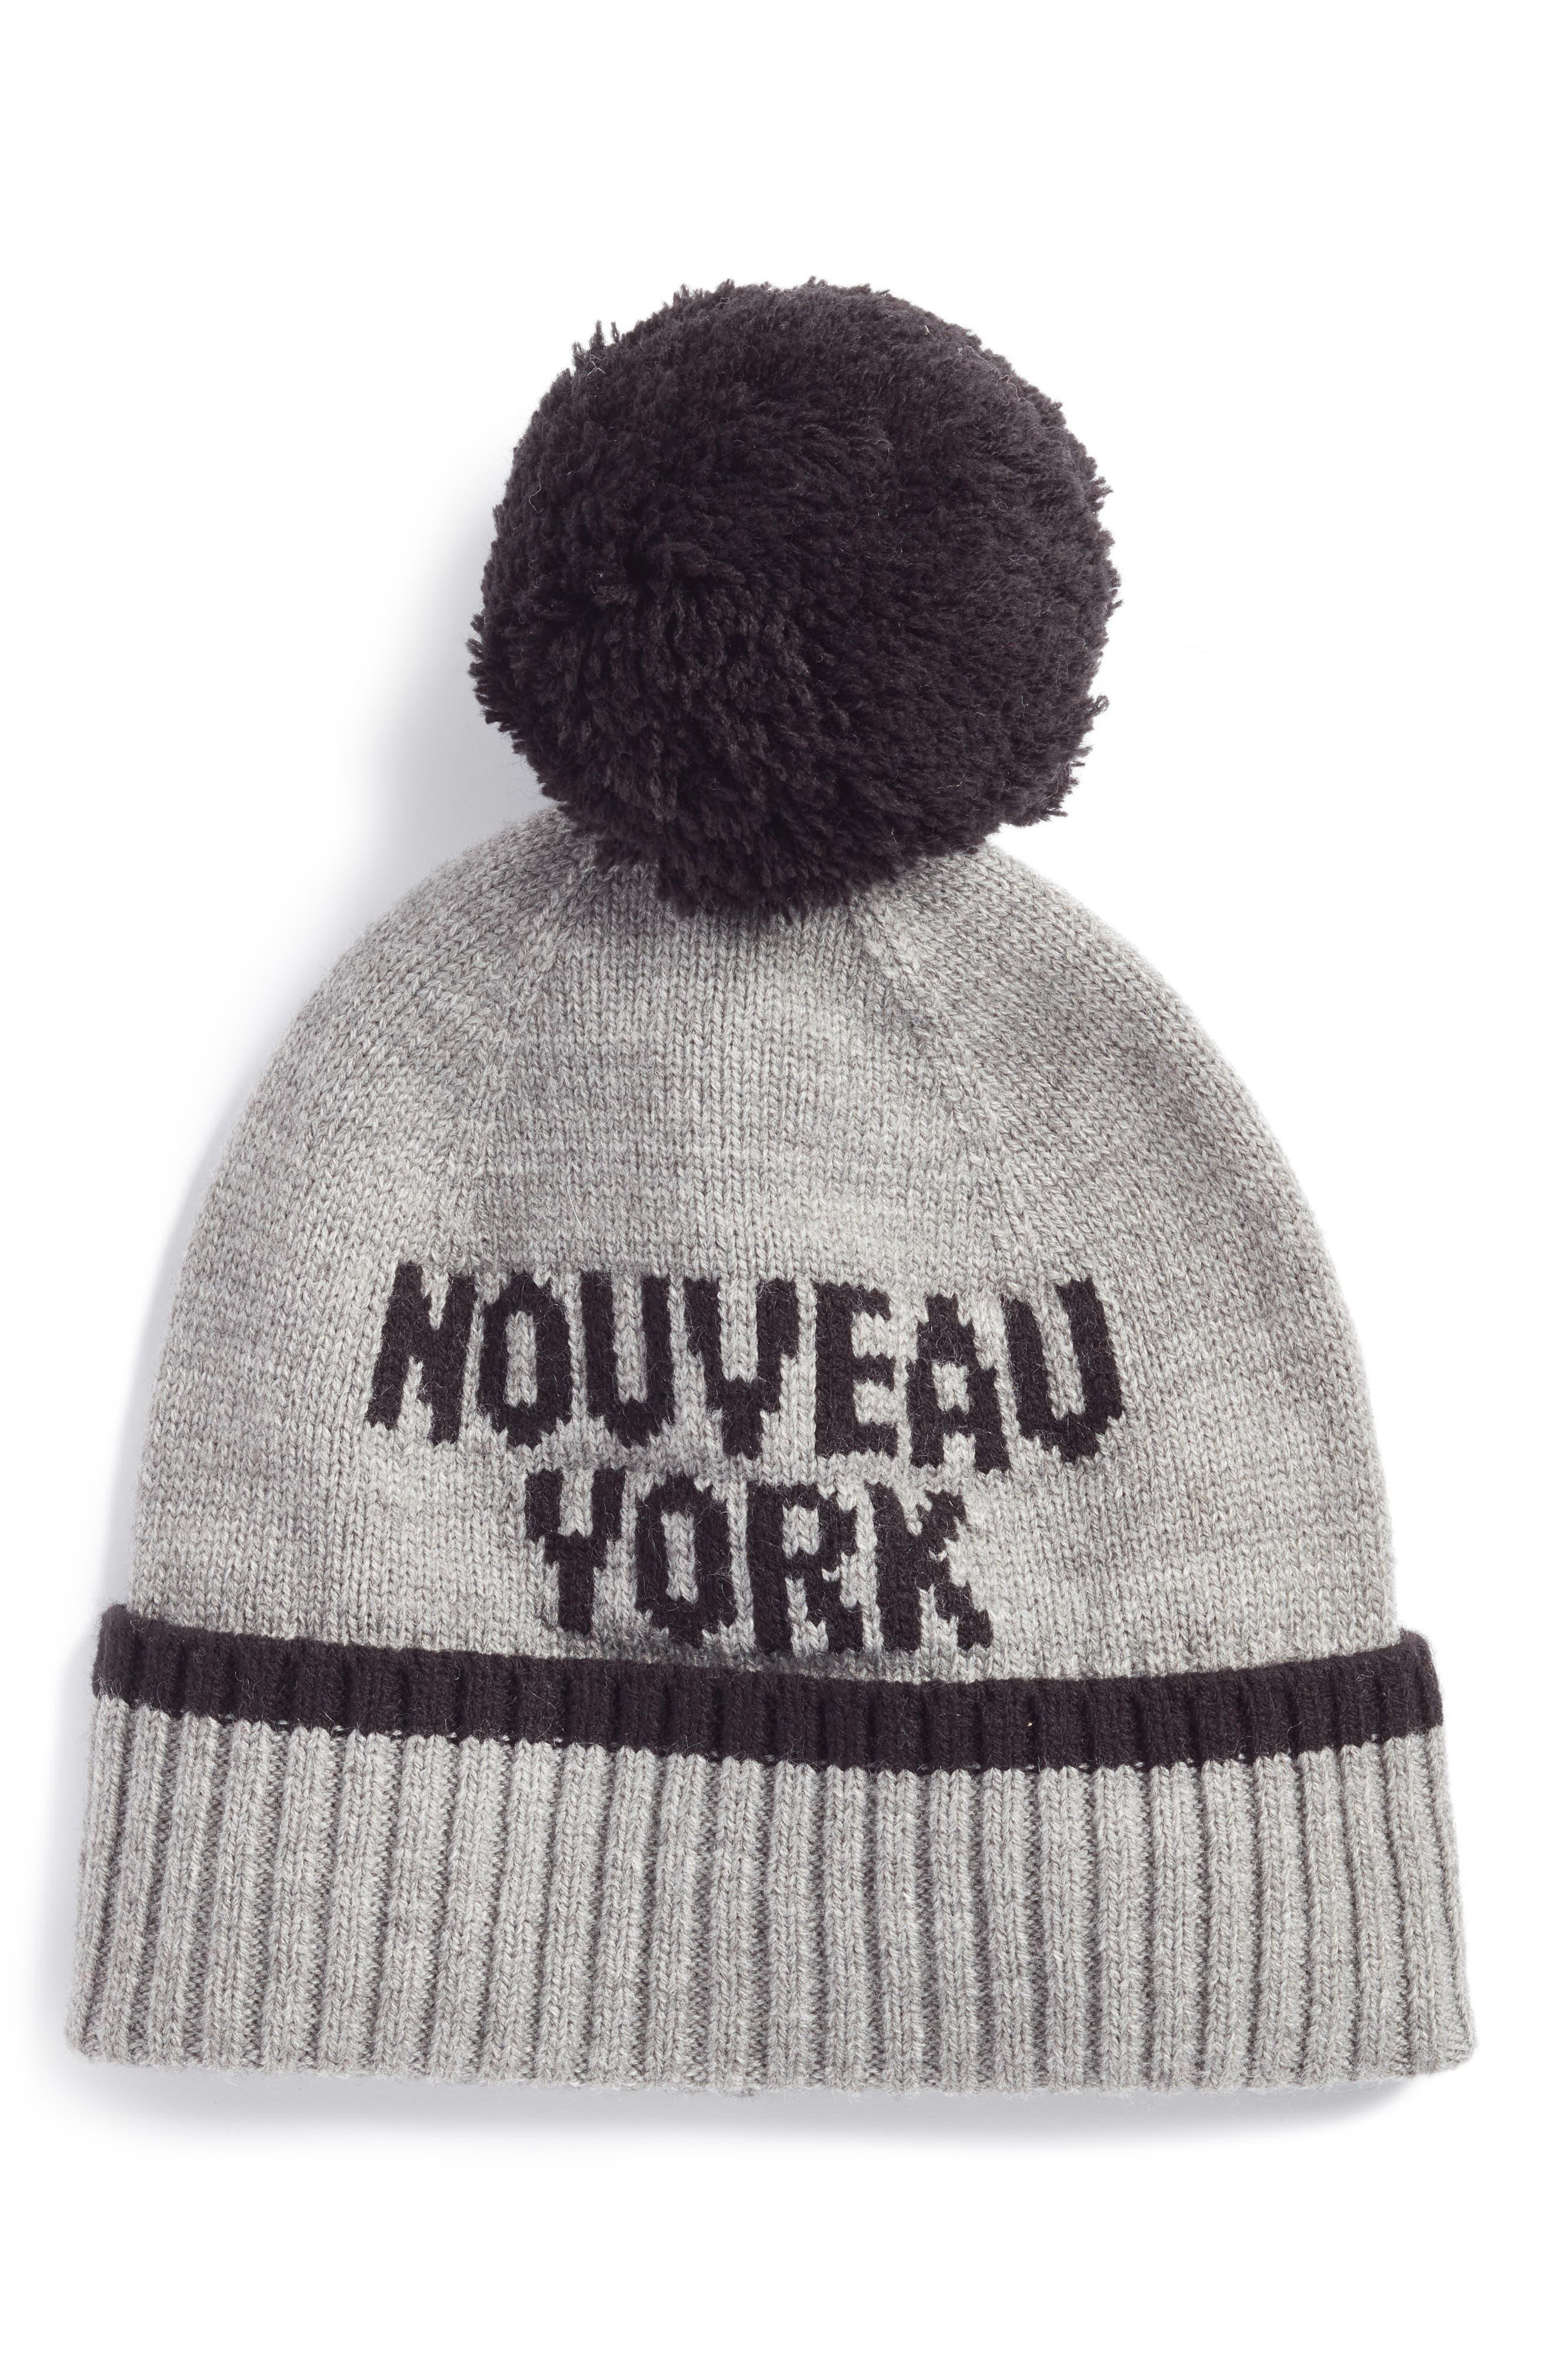 nouveau york pom beanie,                             Main thumbnail 1, color,                             HEATHER GRAY/ BLACK